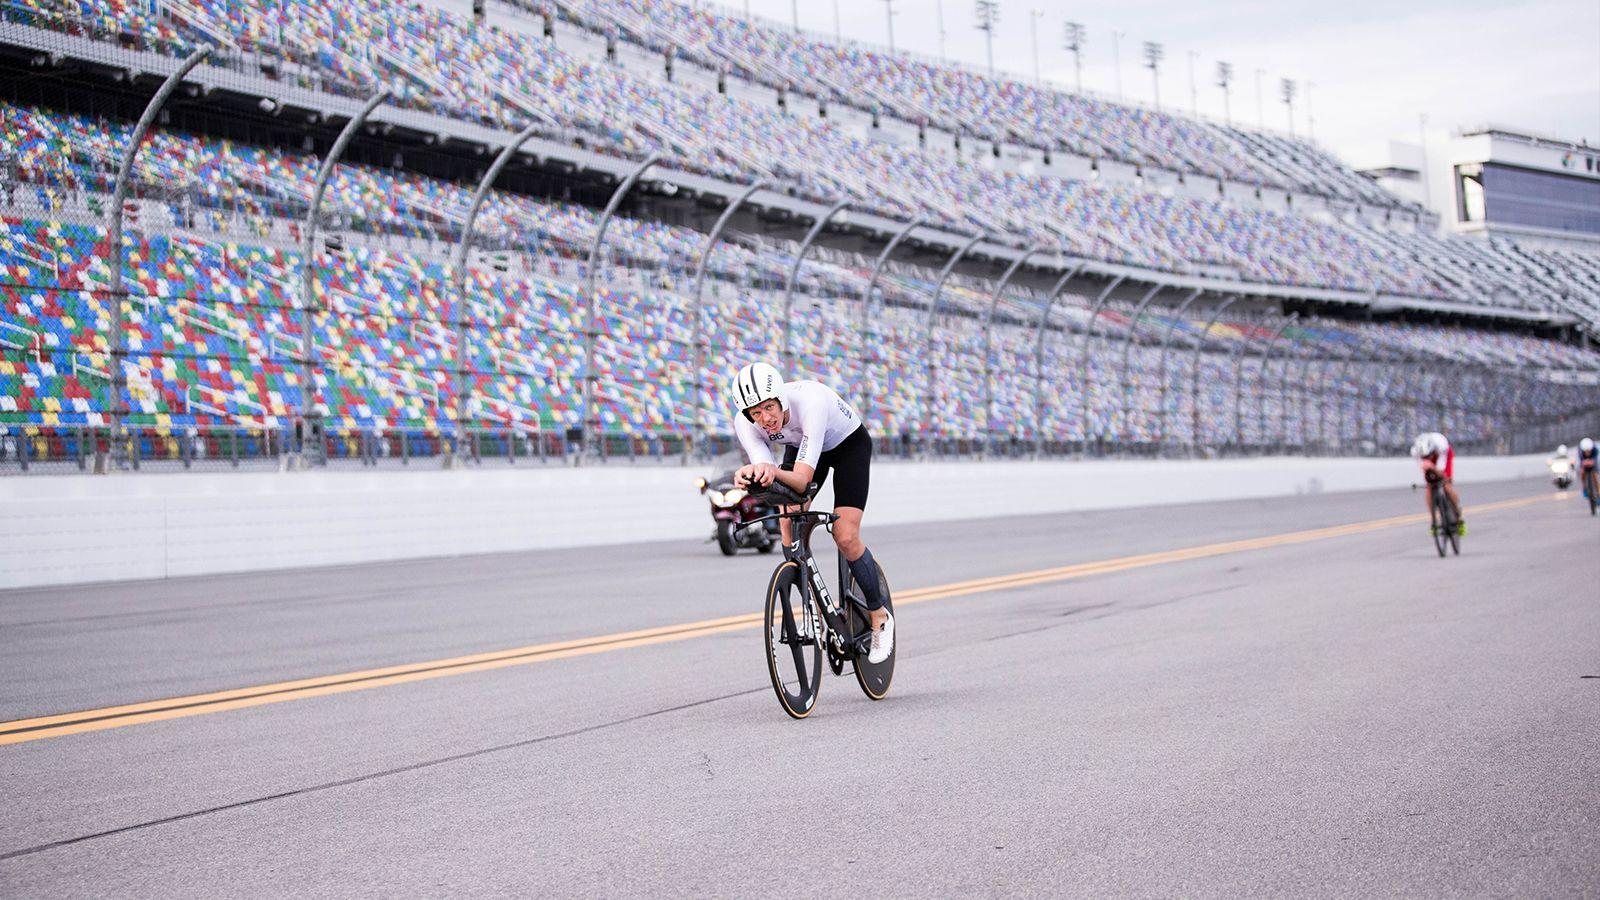 Building the 'Ultimate Daytona Triathlete'